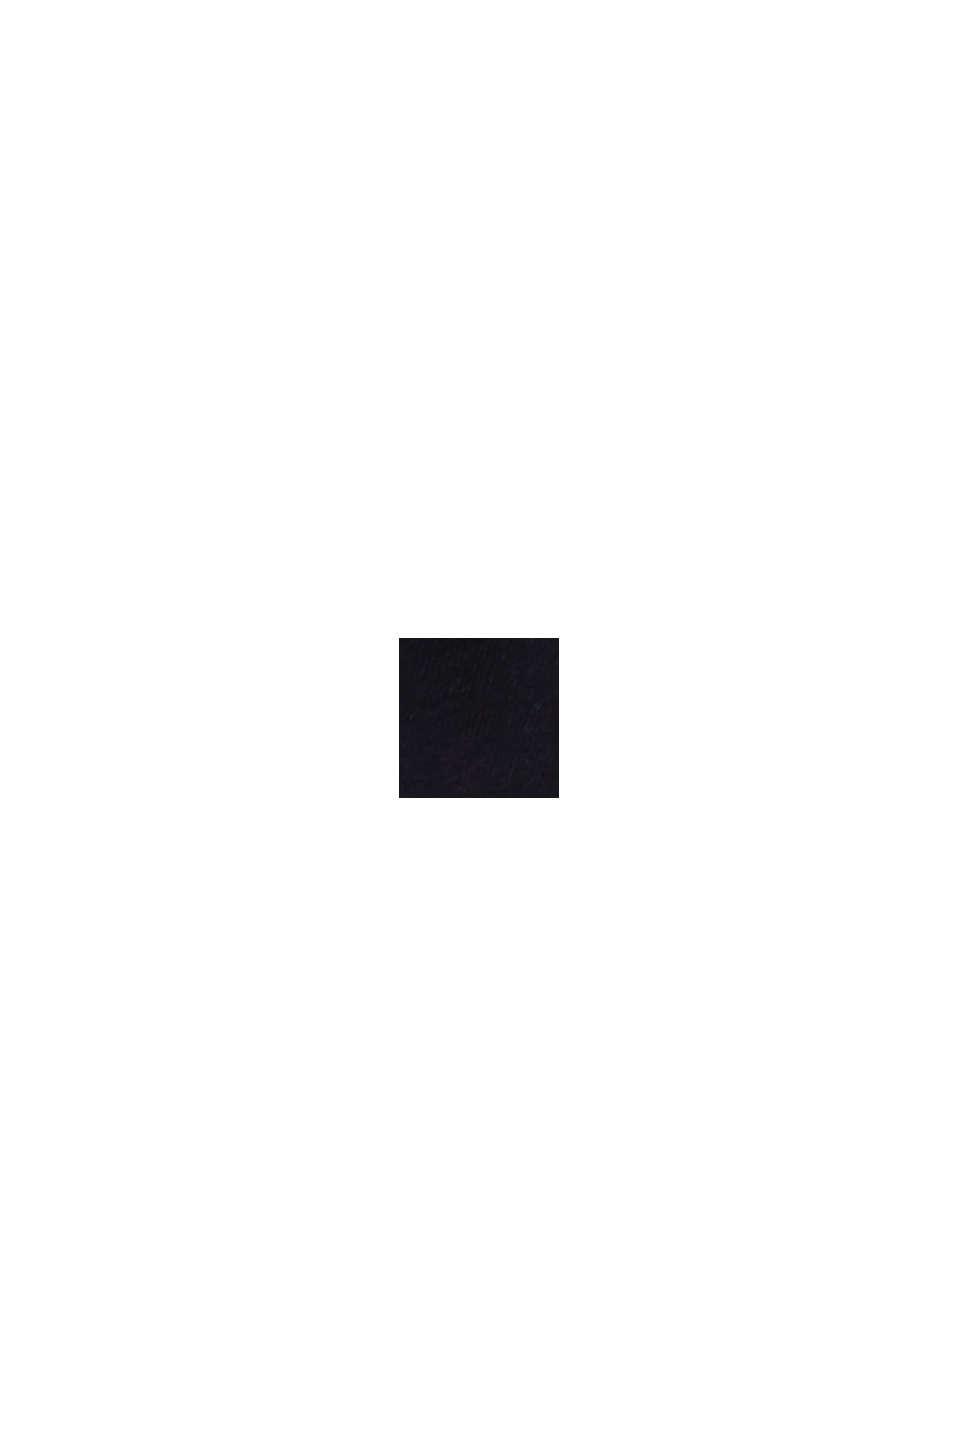 Cardigan, LENZING™ ECOVERO™, BLACK, swatch